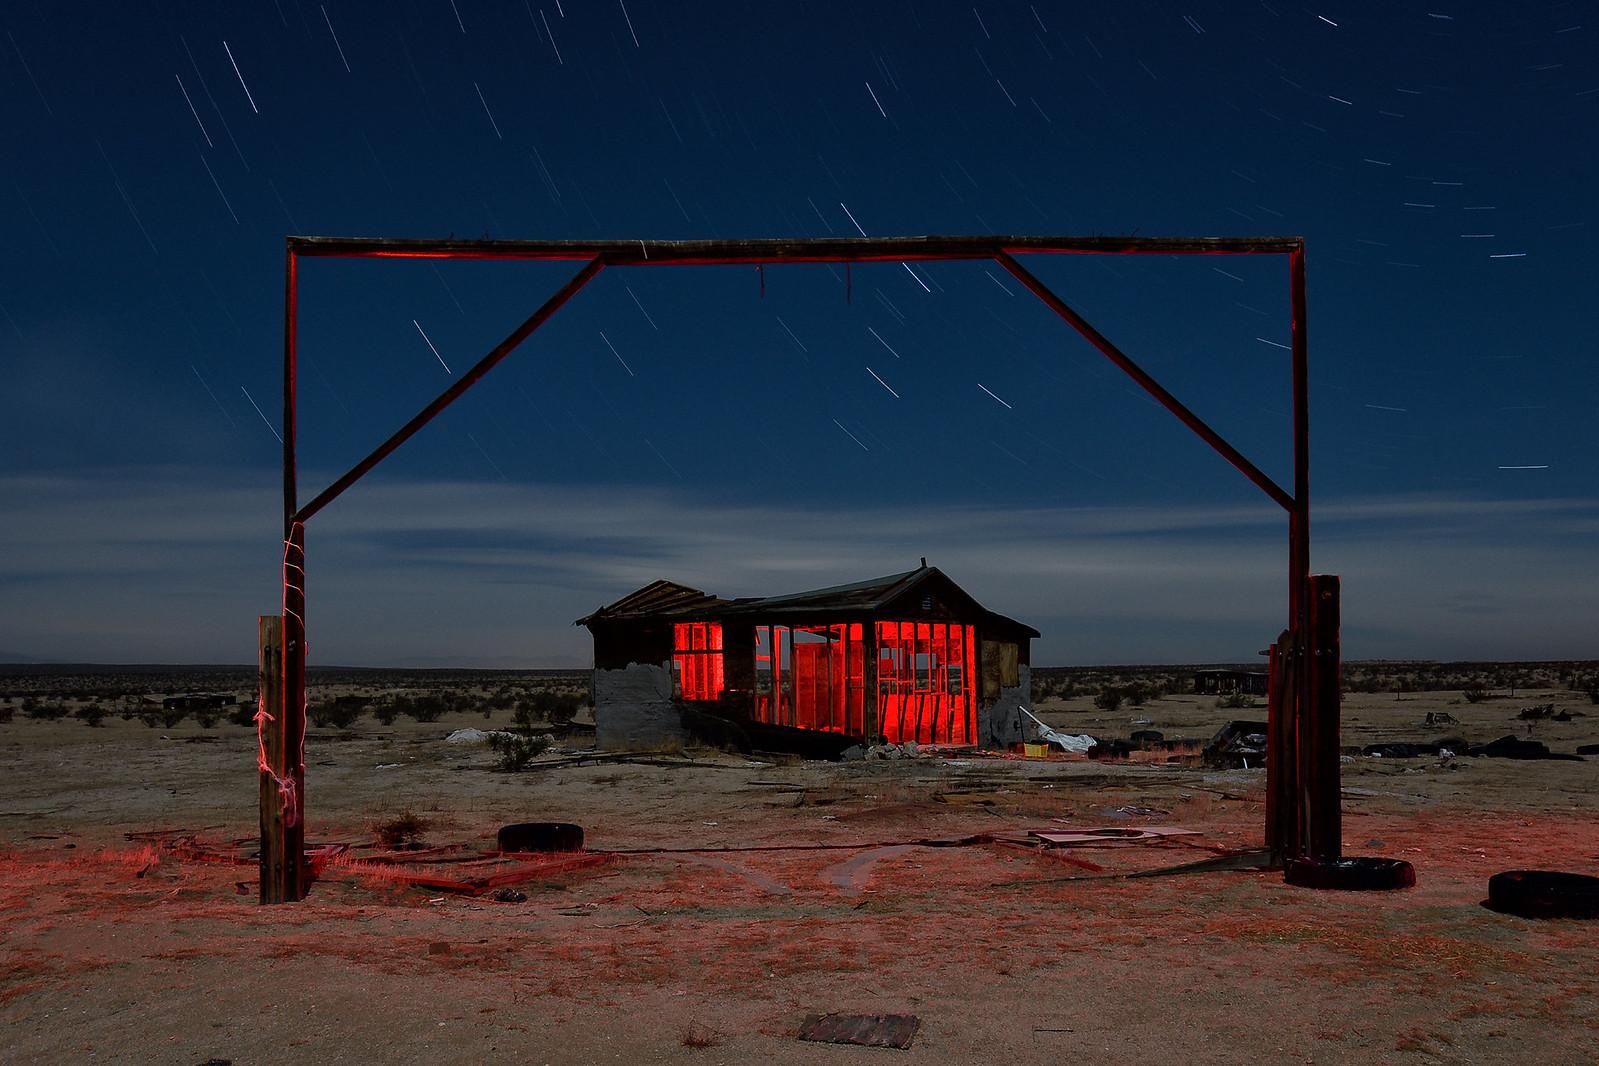 homestead. mojave desert, ca. 2018. | by eyetwist